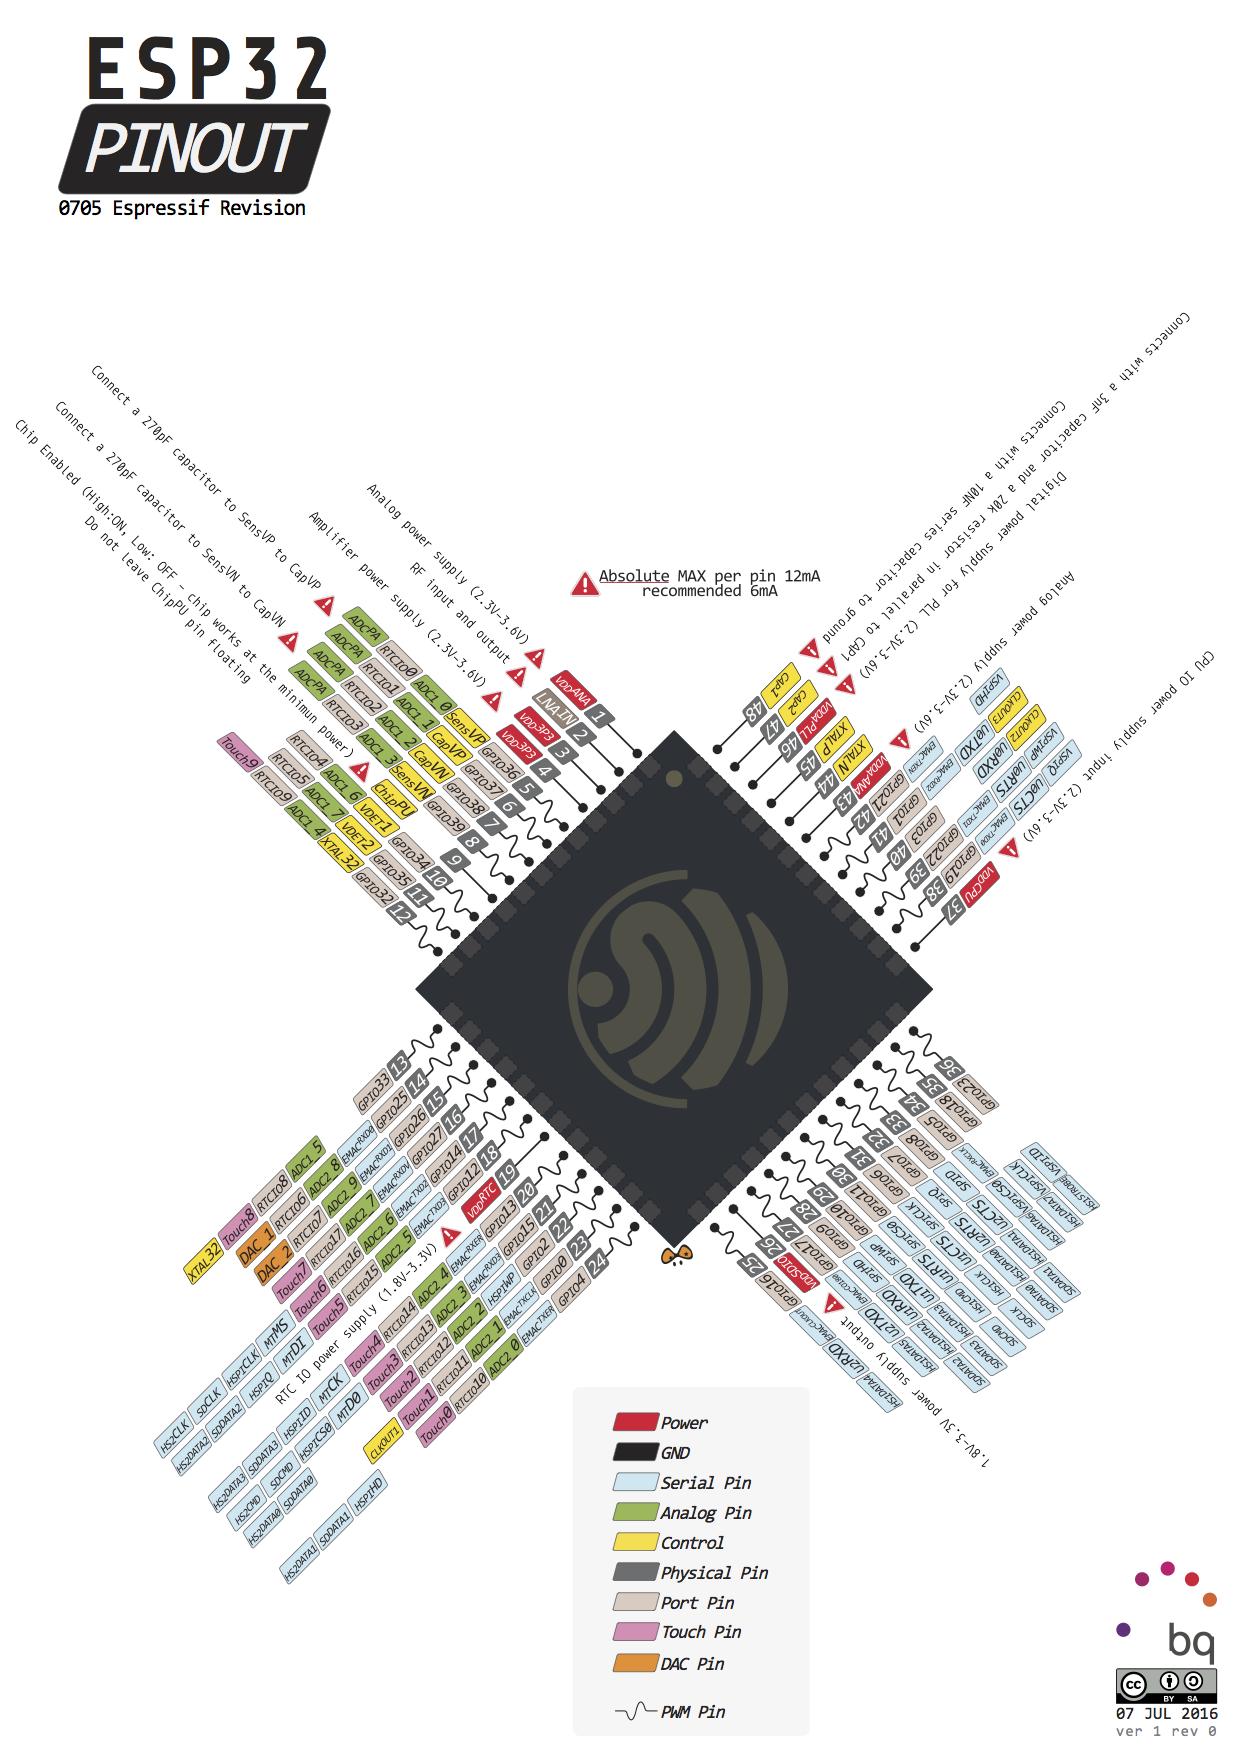 The New Esp32 Espressifsystem Specs Pinout Datasheet Diy Smart Car Fuse Box Location As Well Microsquirt Wiring Diagram